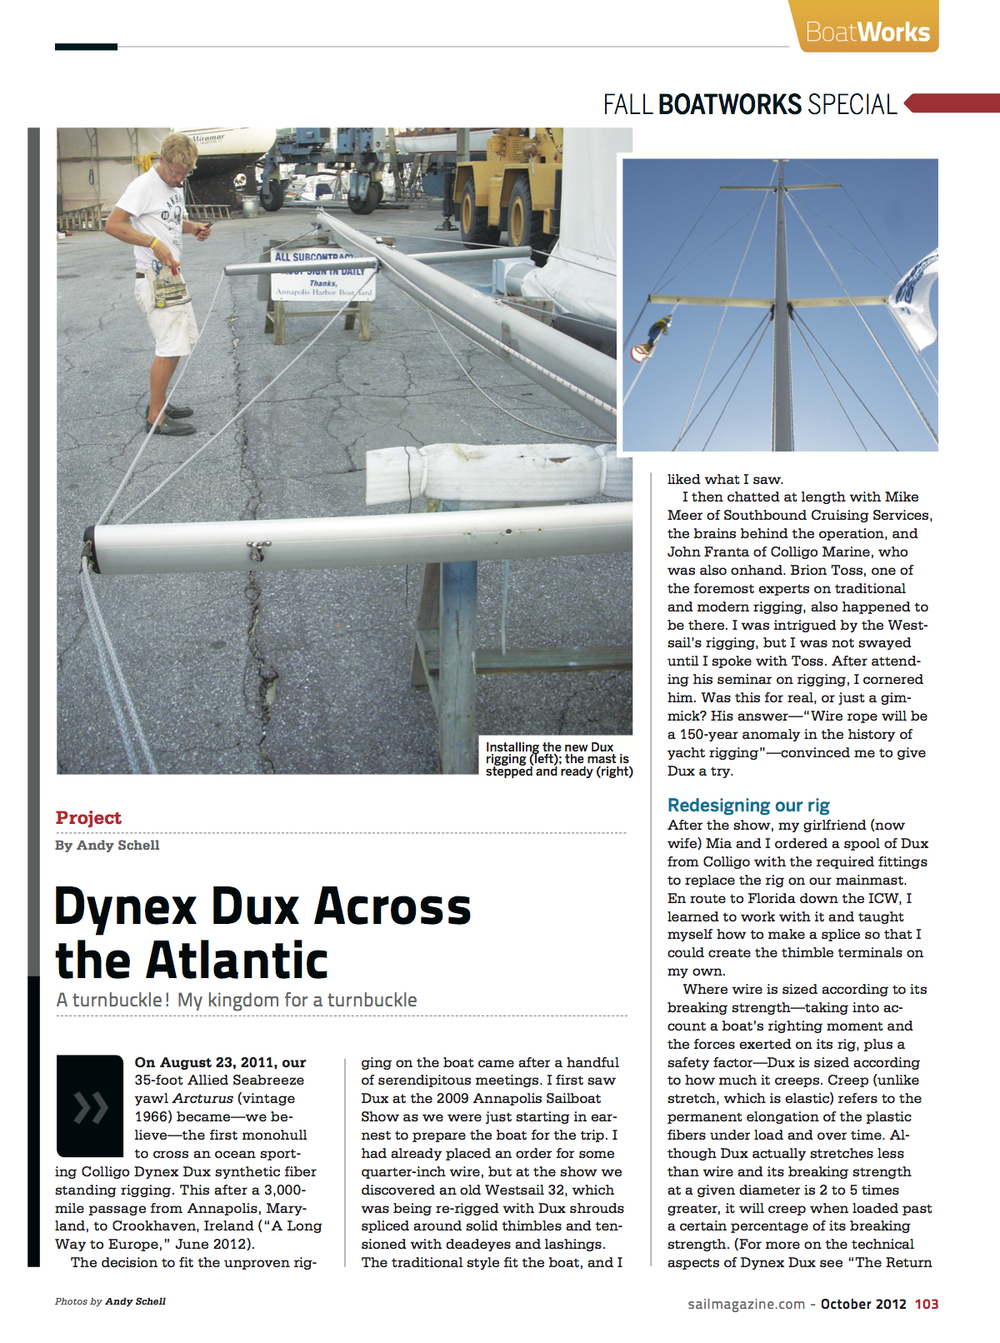 SAIL: Dynex Dux Across the Atlantic